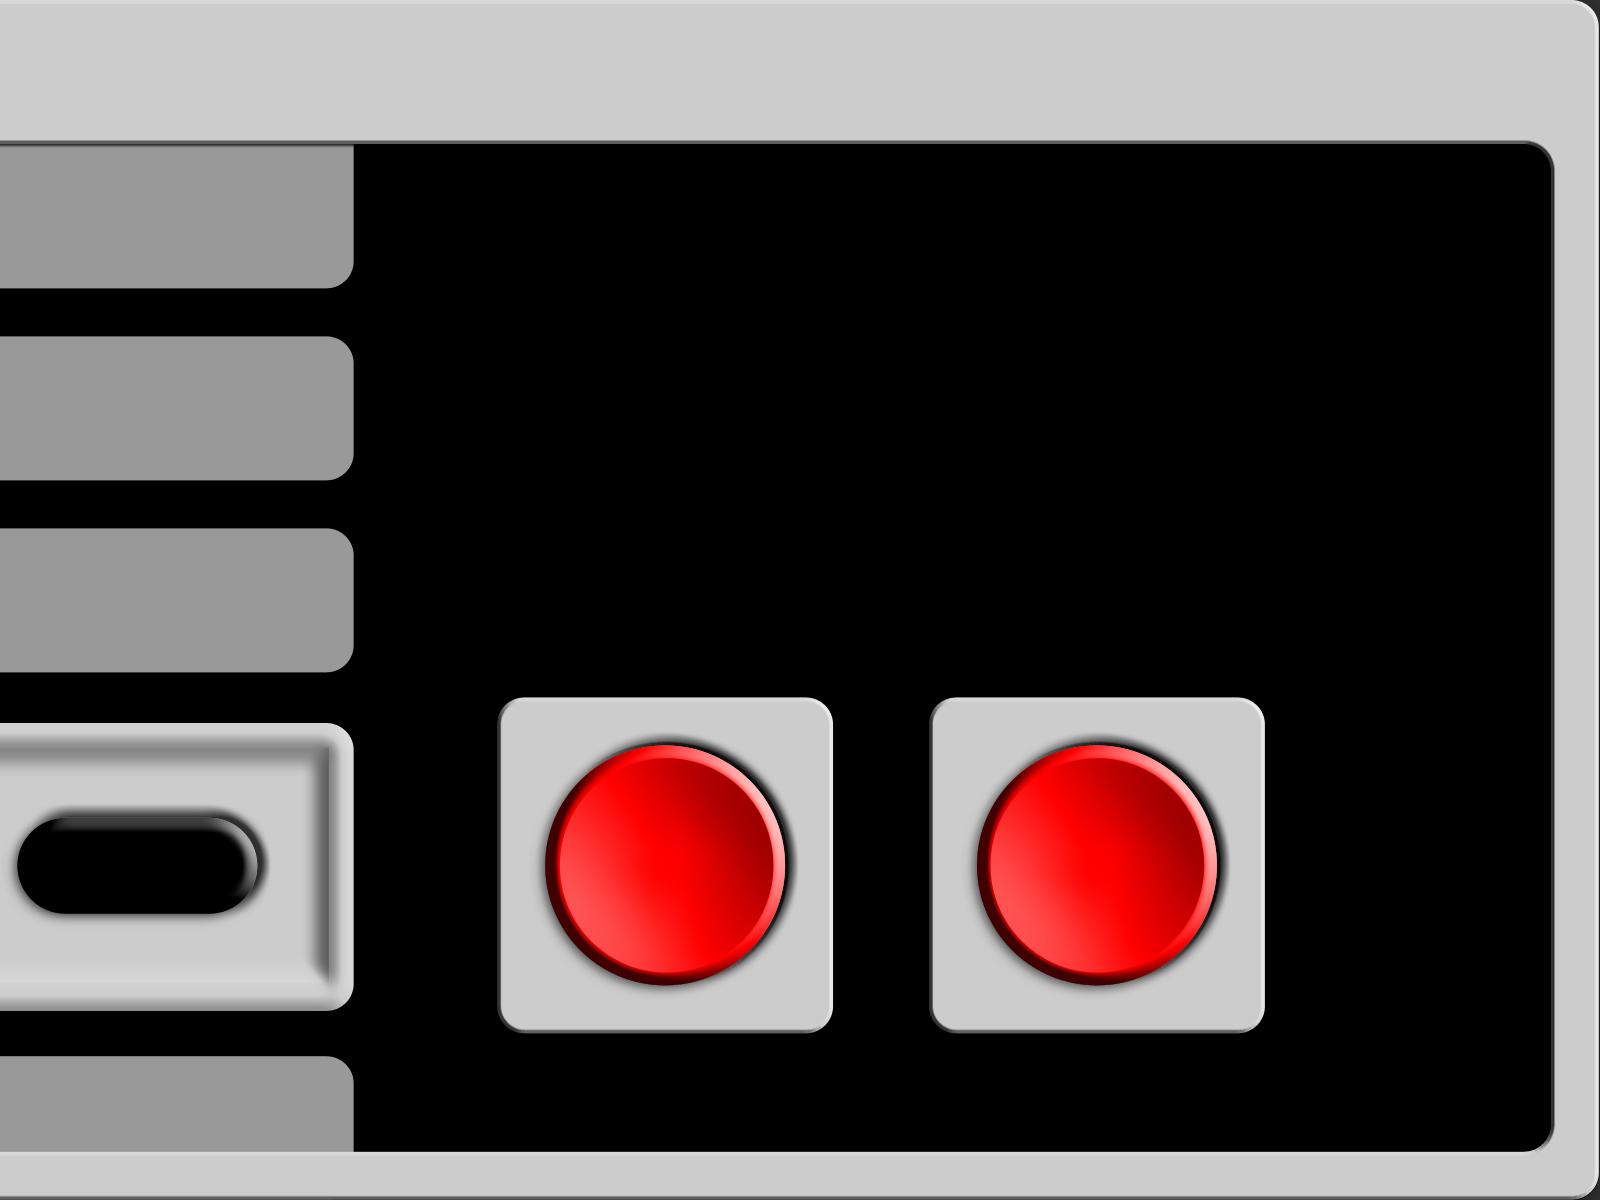 De 20 bästa NES-spelen: Plats 4